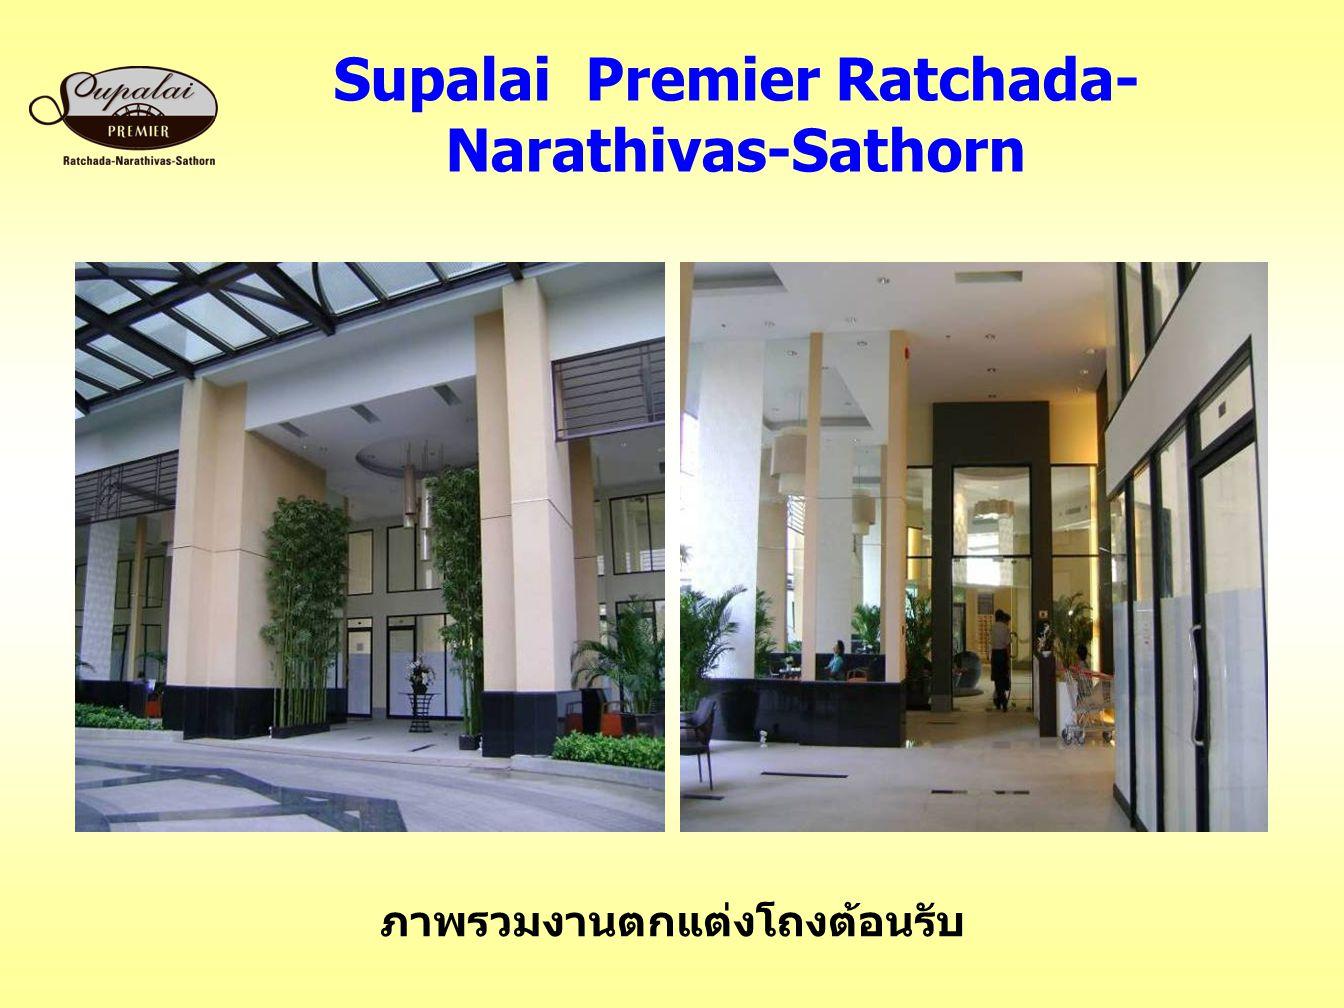 Supalai Premier Ratchada- Narathivas-Sathorn ภาพรวมงานตกแต่งโถงต้อนรับ